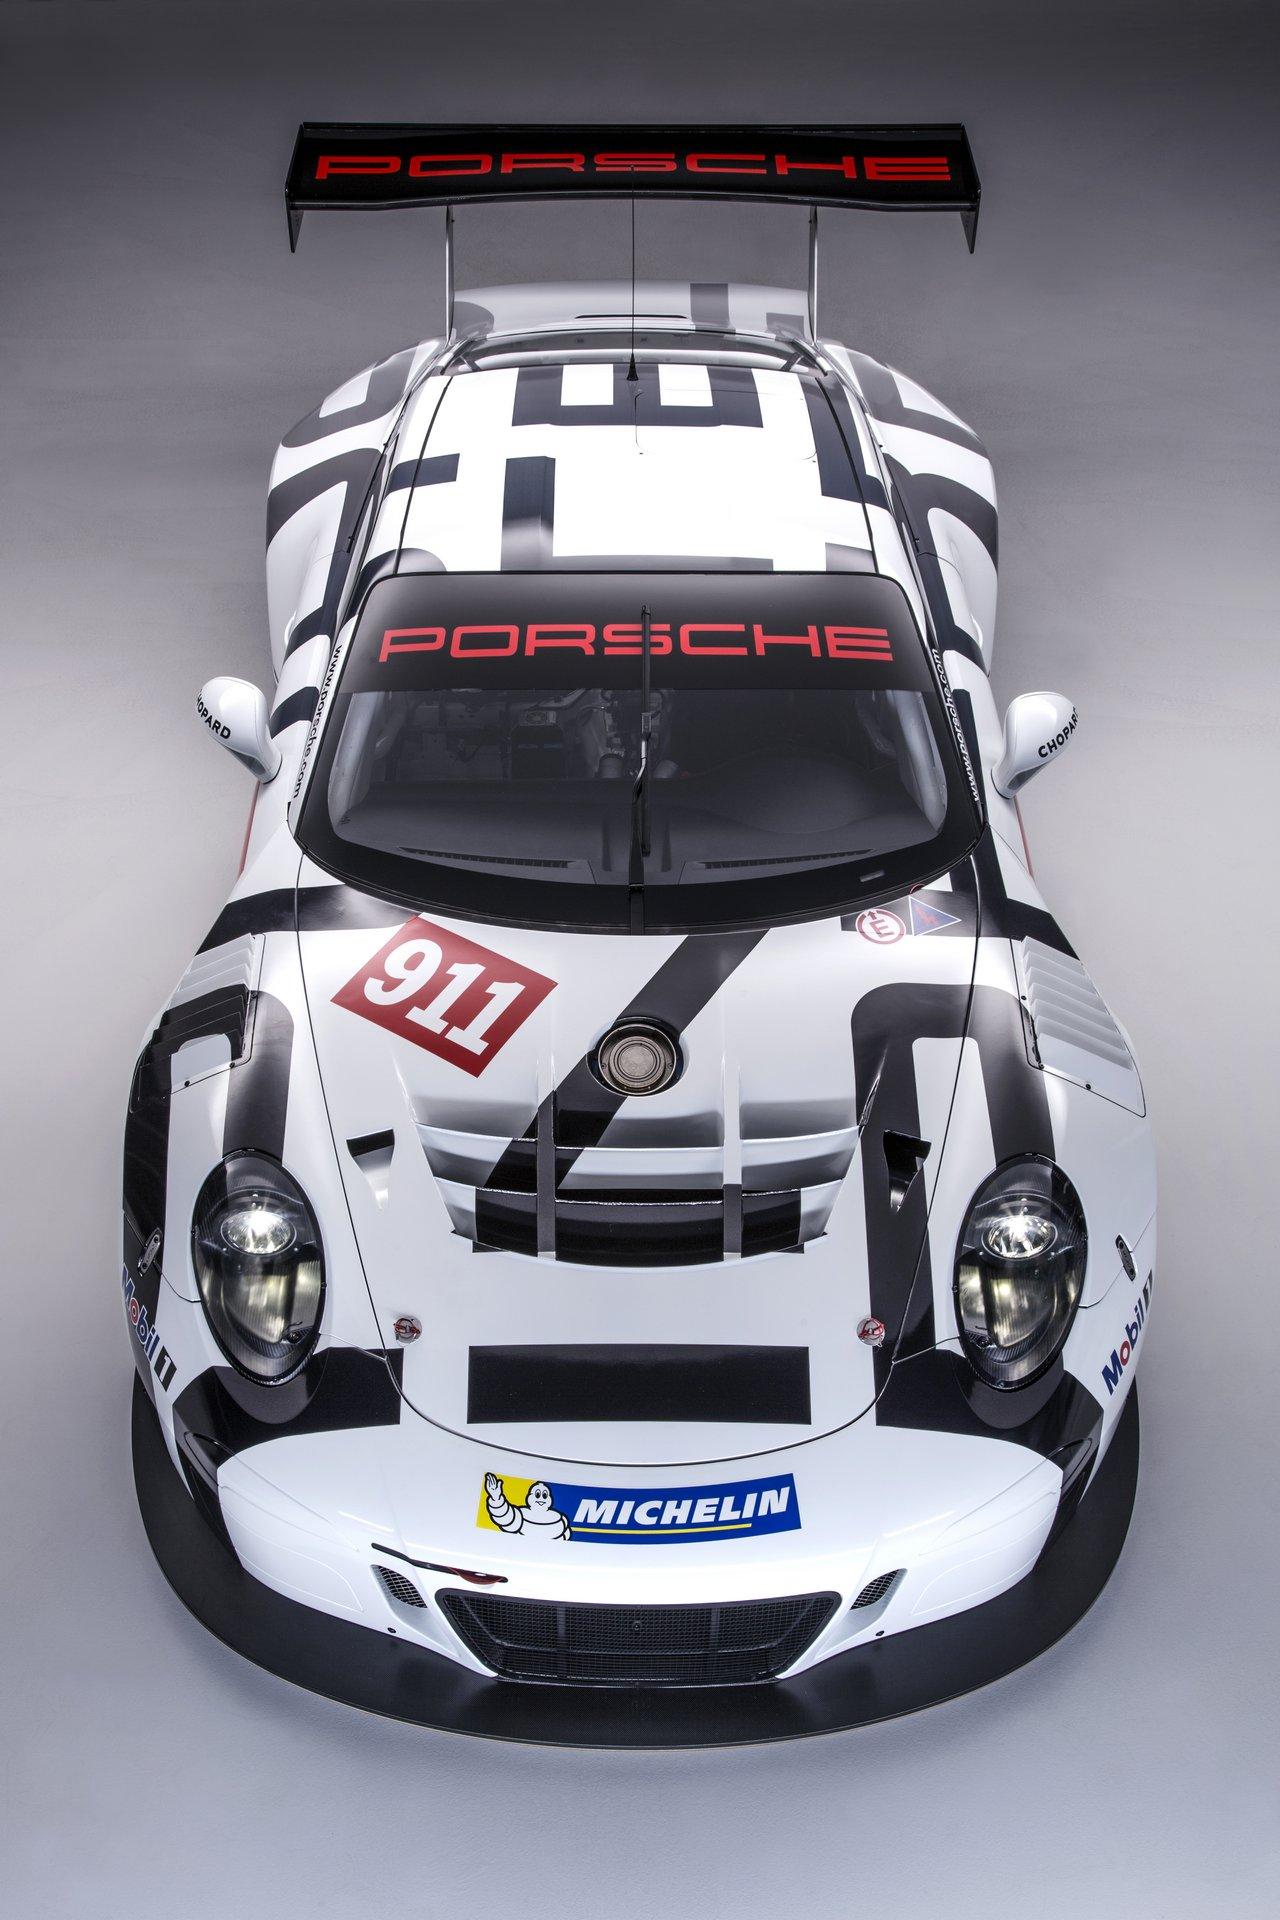 porsche-911-991-GT3-R-0-100-20